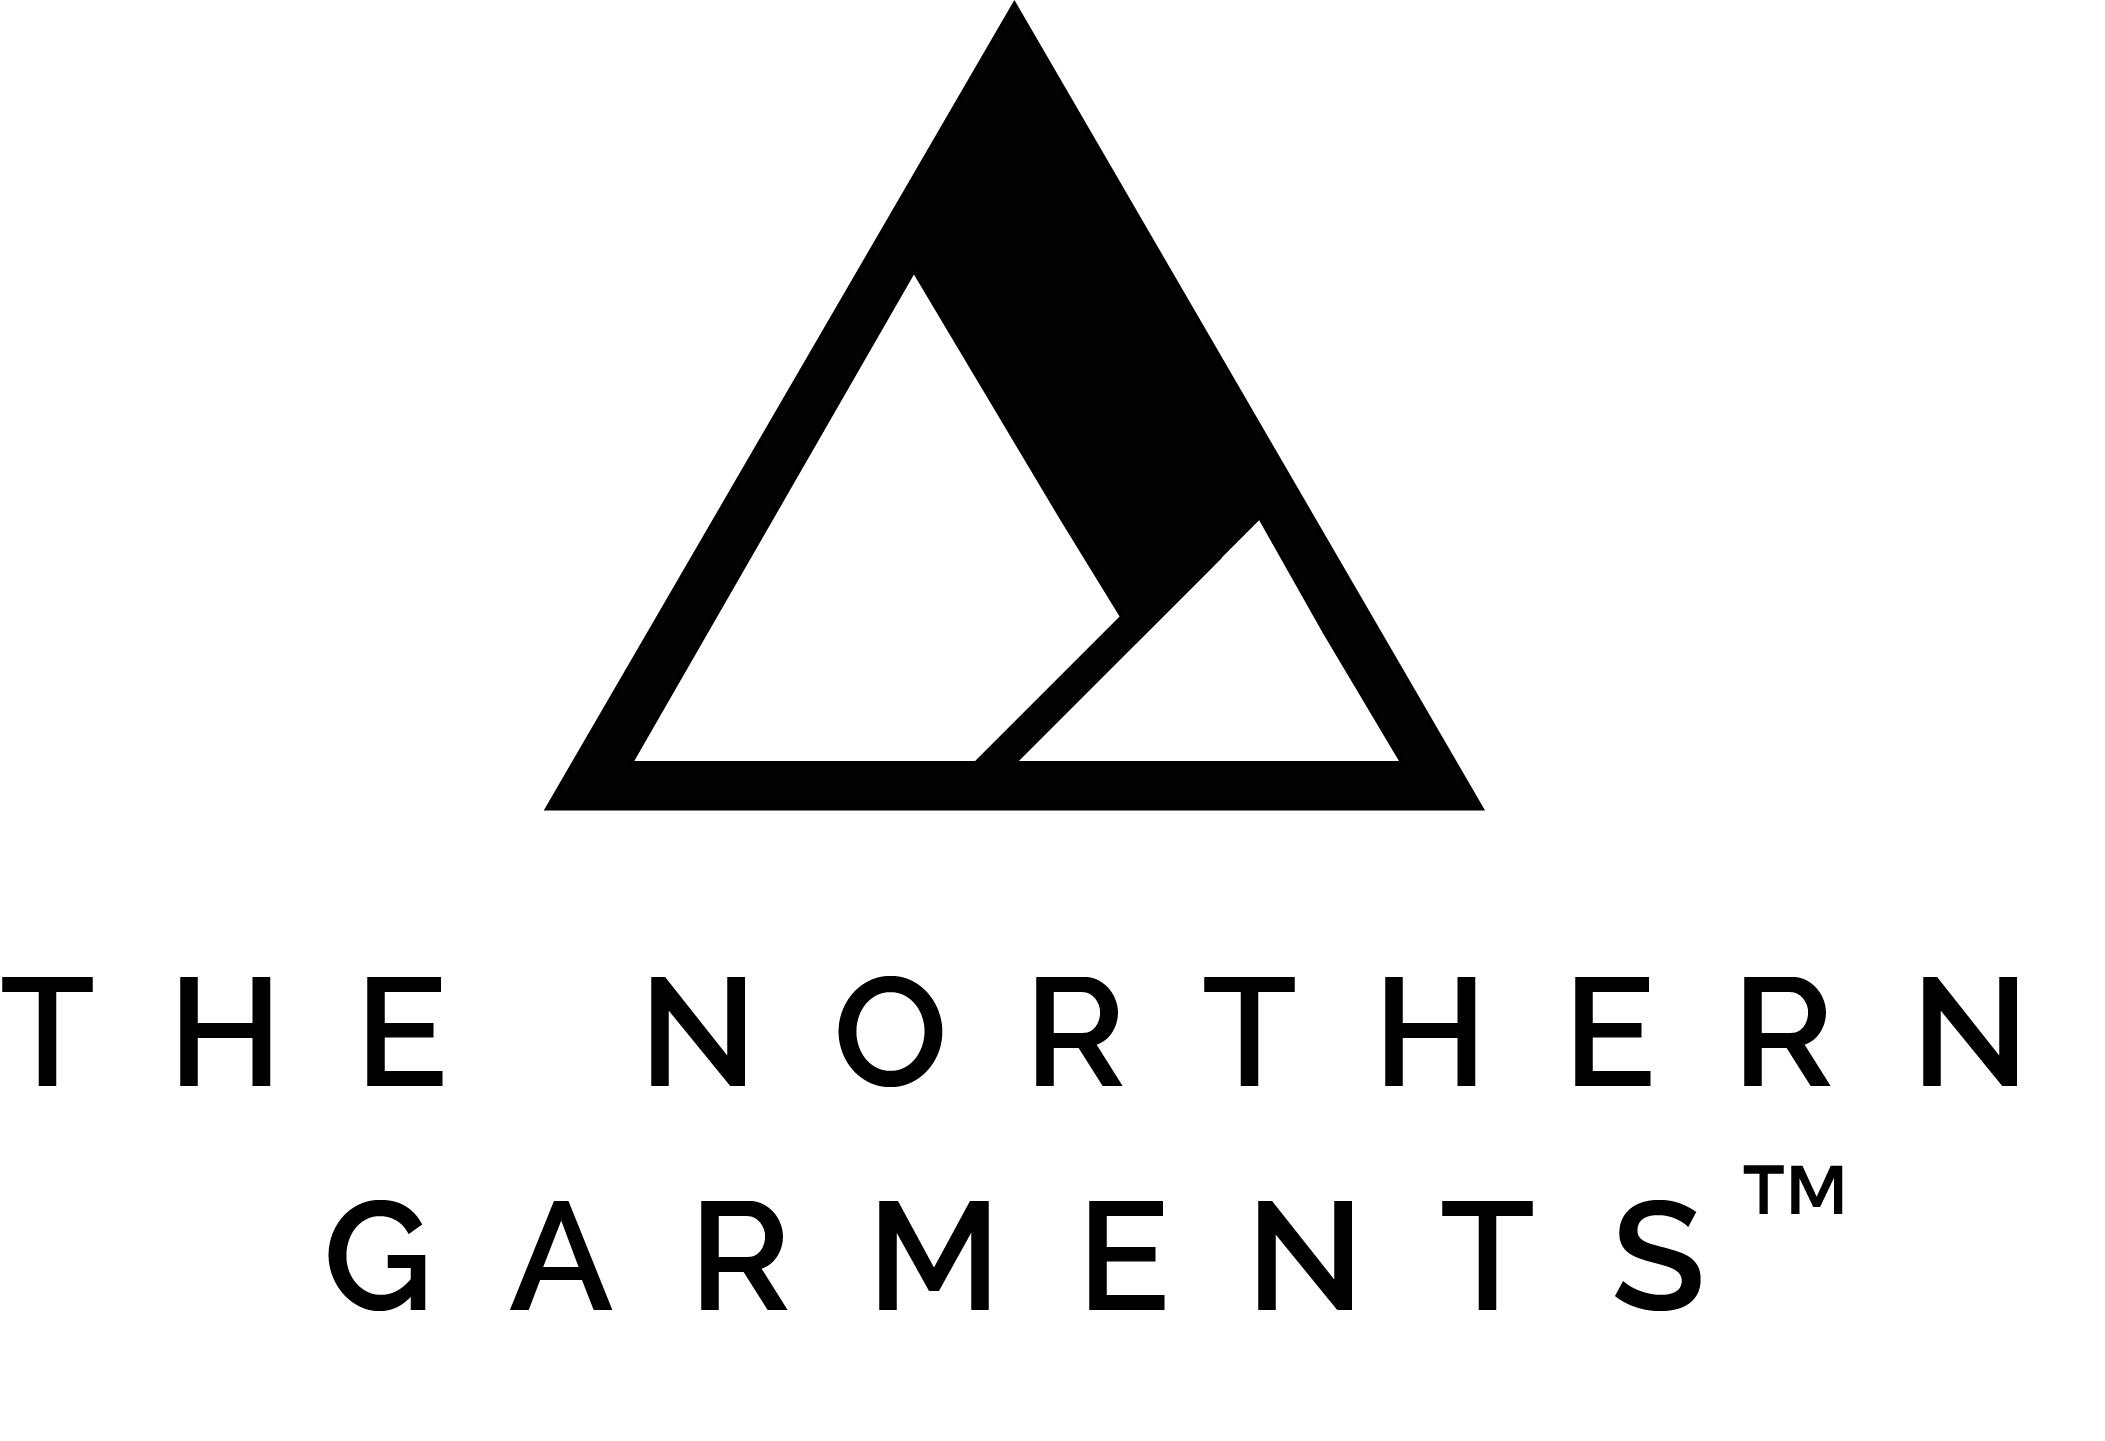 Wort-/Bildmarke: THE NORTHERN GARMENTS